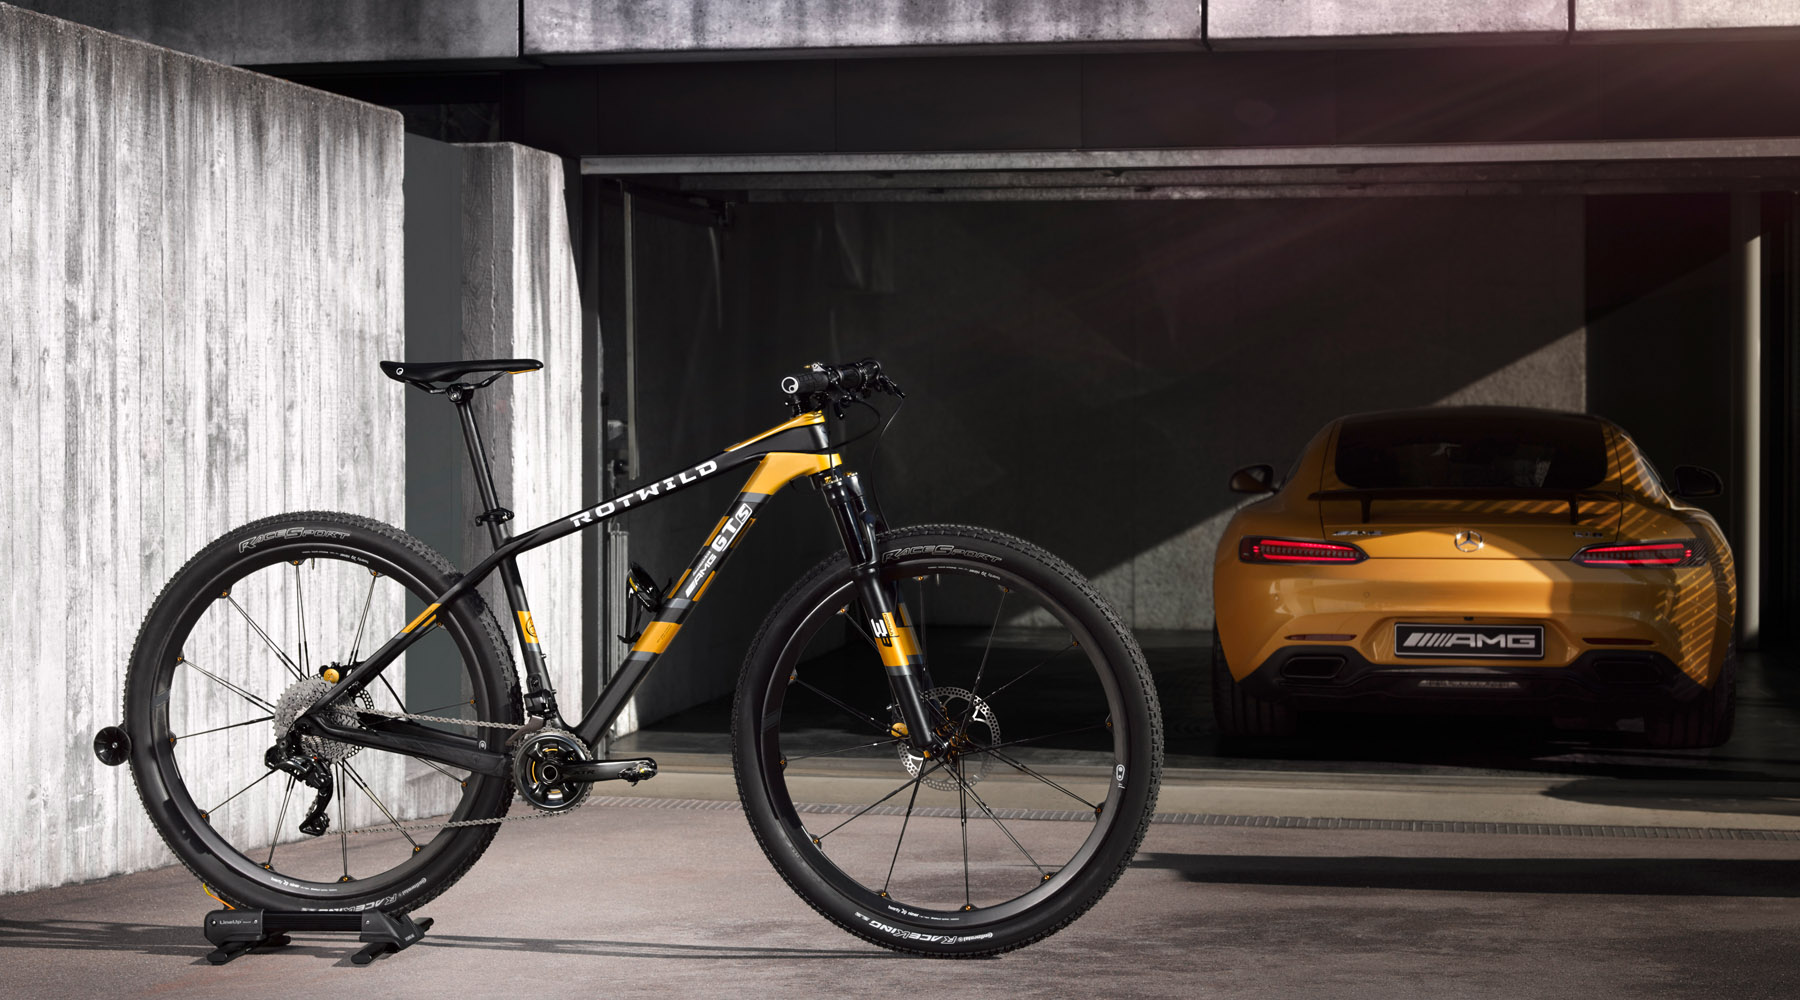 Mercedes-Benz & Rotwild Bisiklet-amg